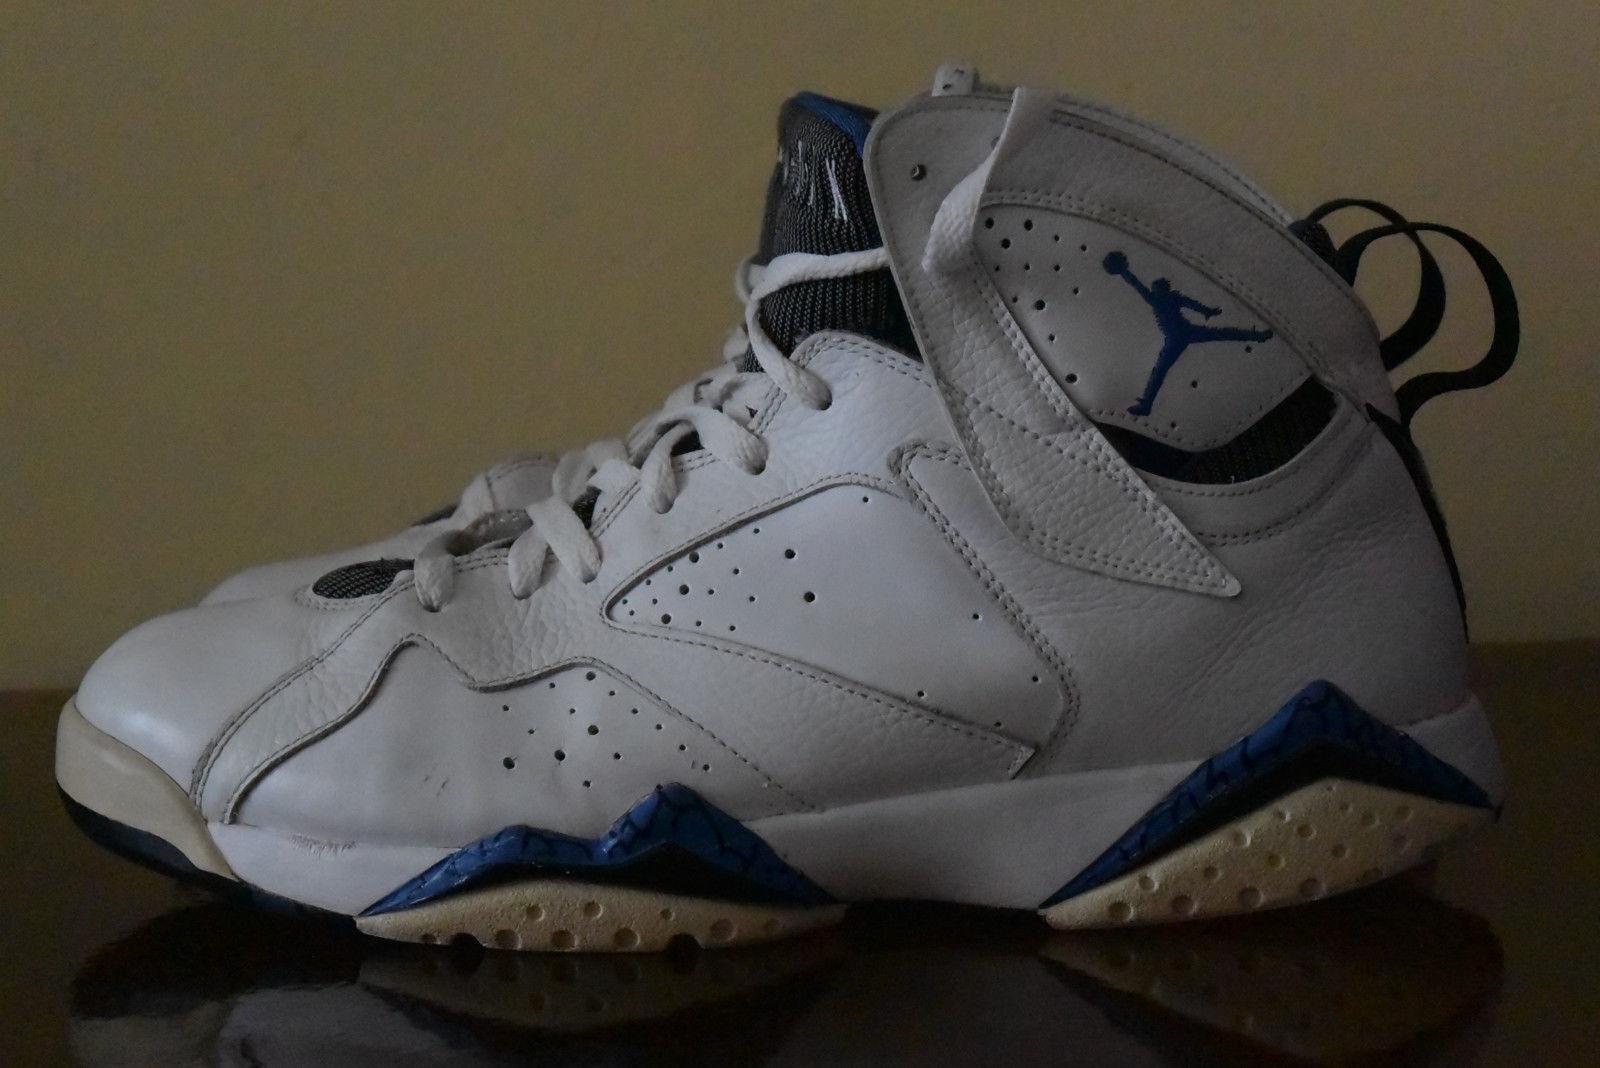 Nike Air Jordan 7 VII Retro DMP Orlando Magic White bluee 304775-161 Sz. 11.5